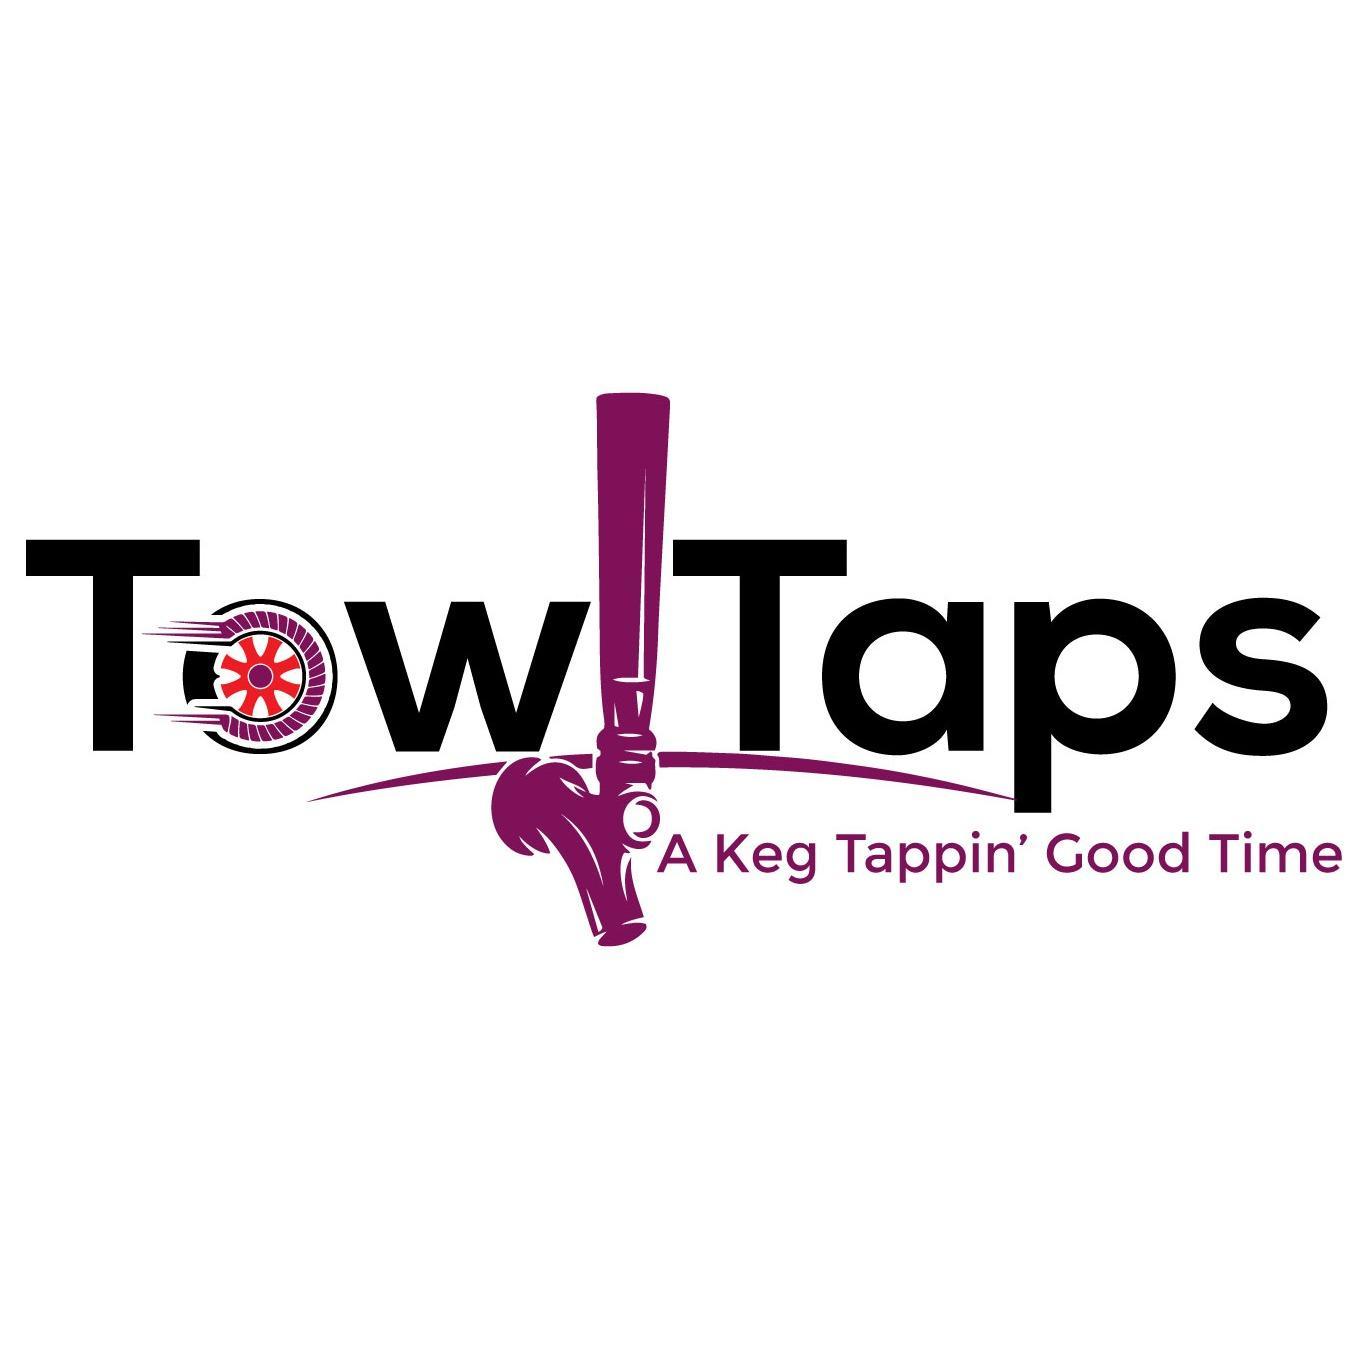 Tow Taps - Windermere, FL 34786 - (407)256-4563 | ShowMeLocal.com